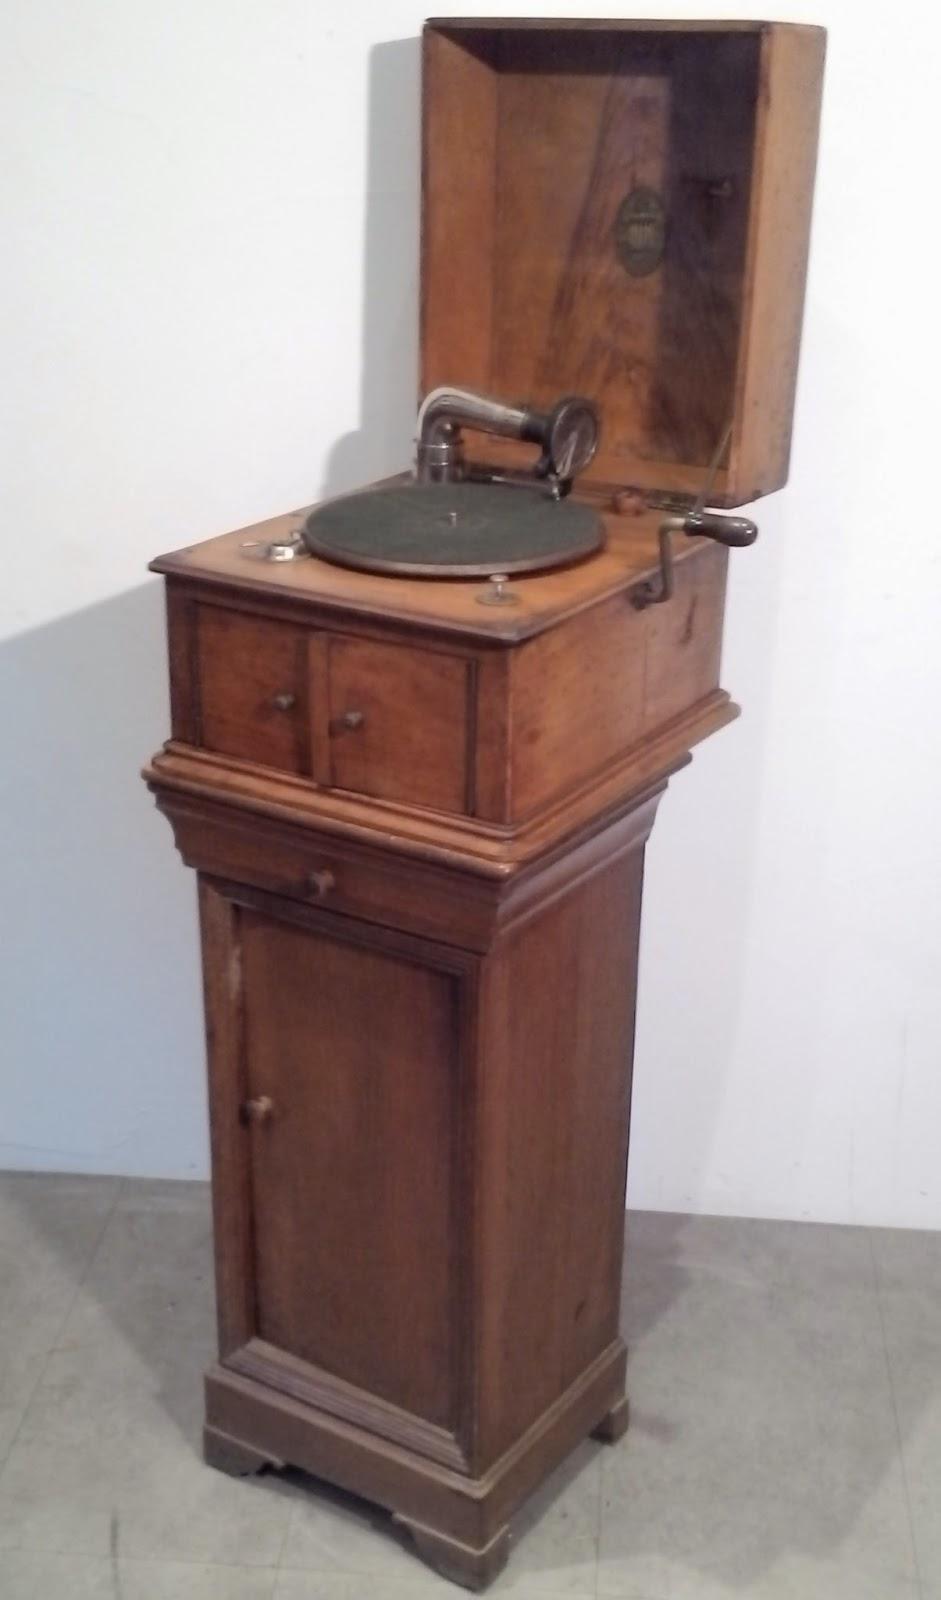 Ancien gramophone od on meuble - Meuble pour tourne disque ...